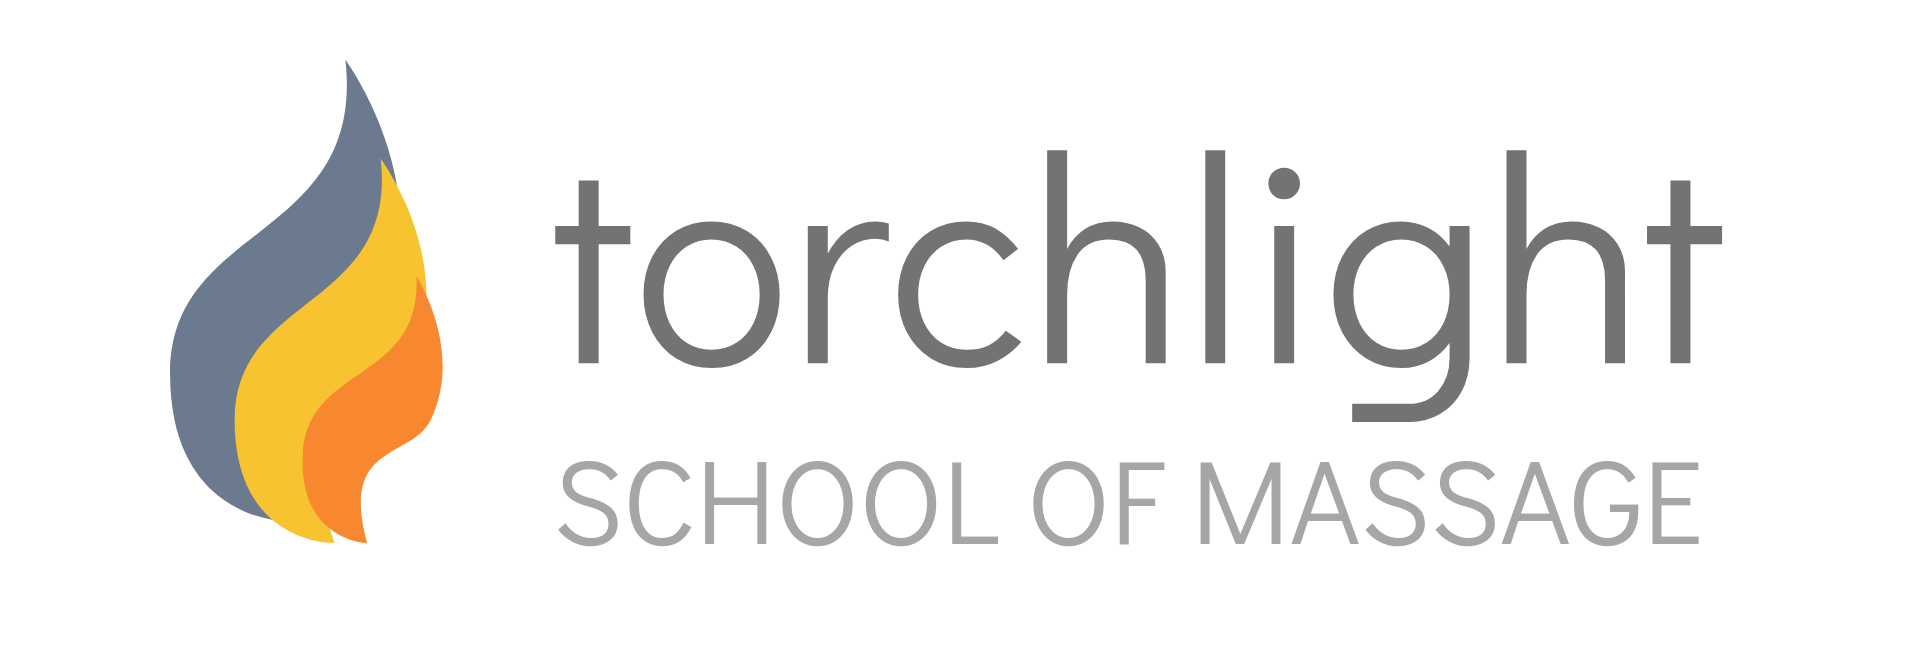 Torchlight School of Massage